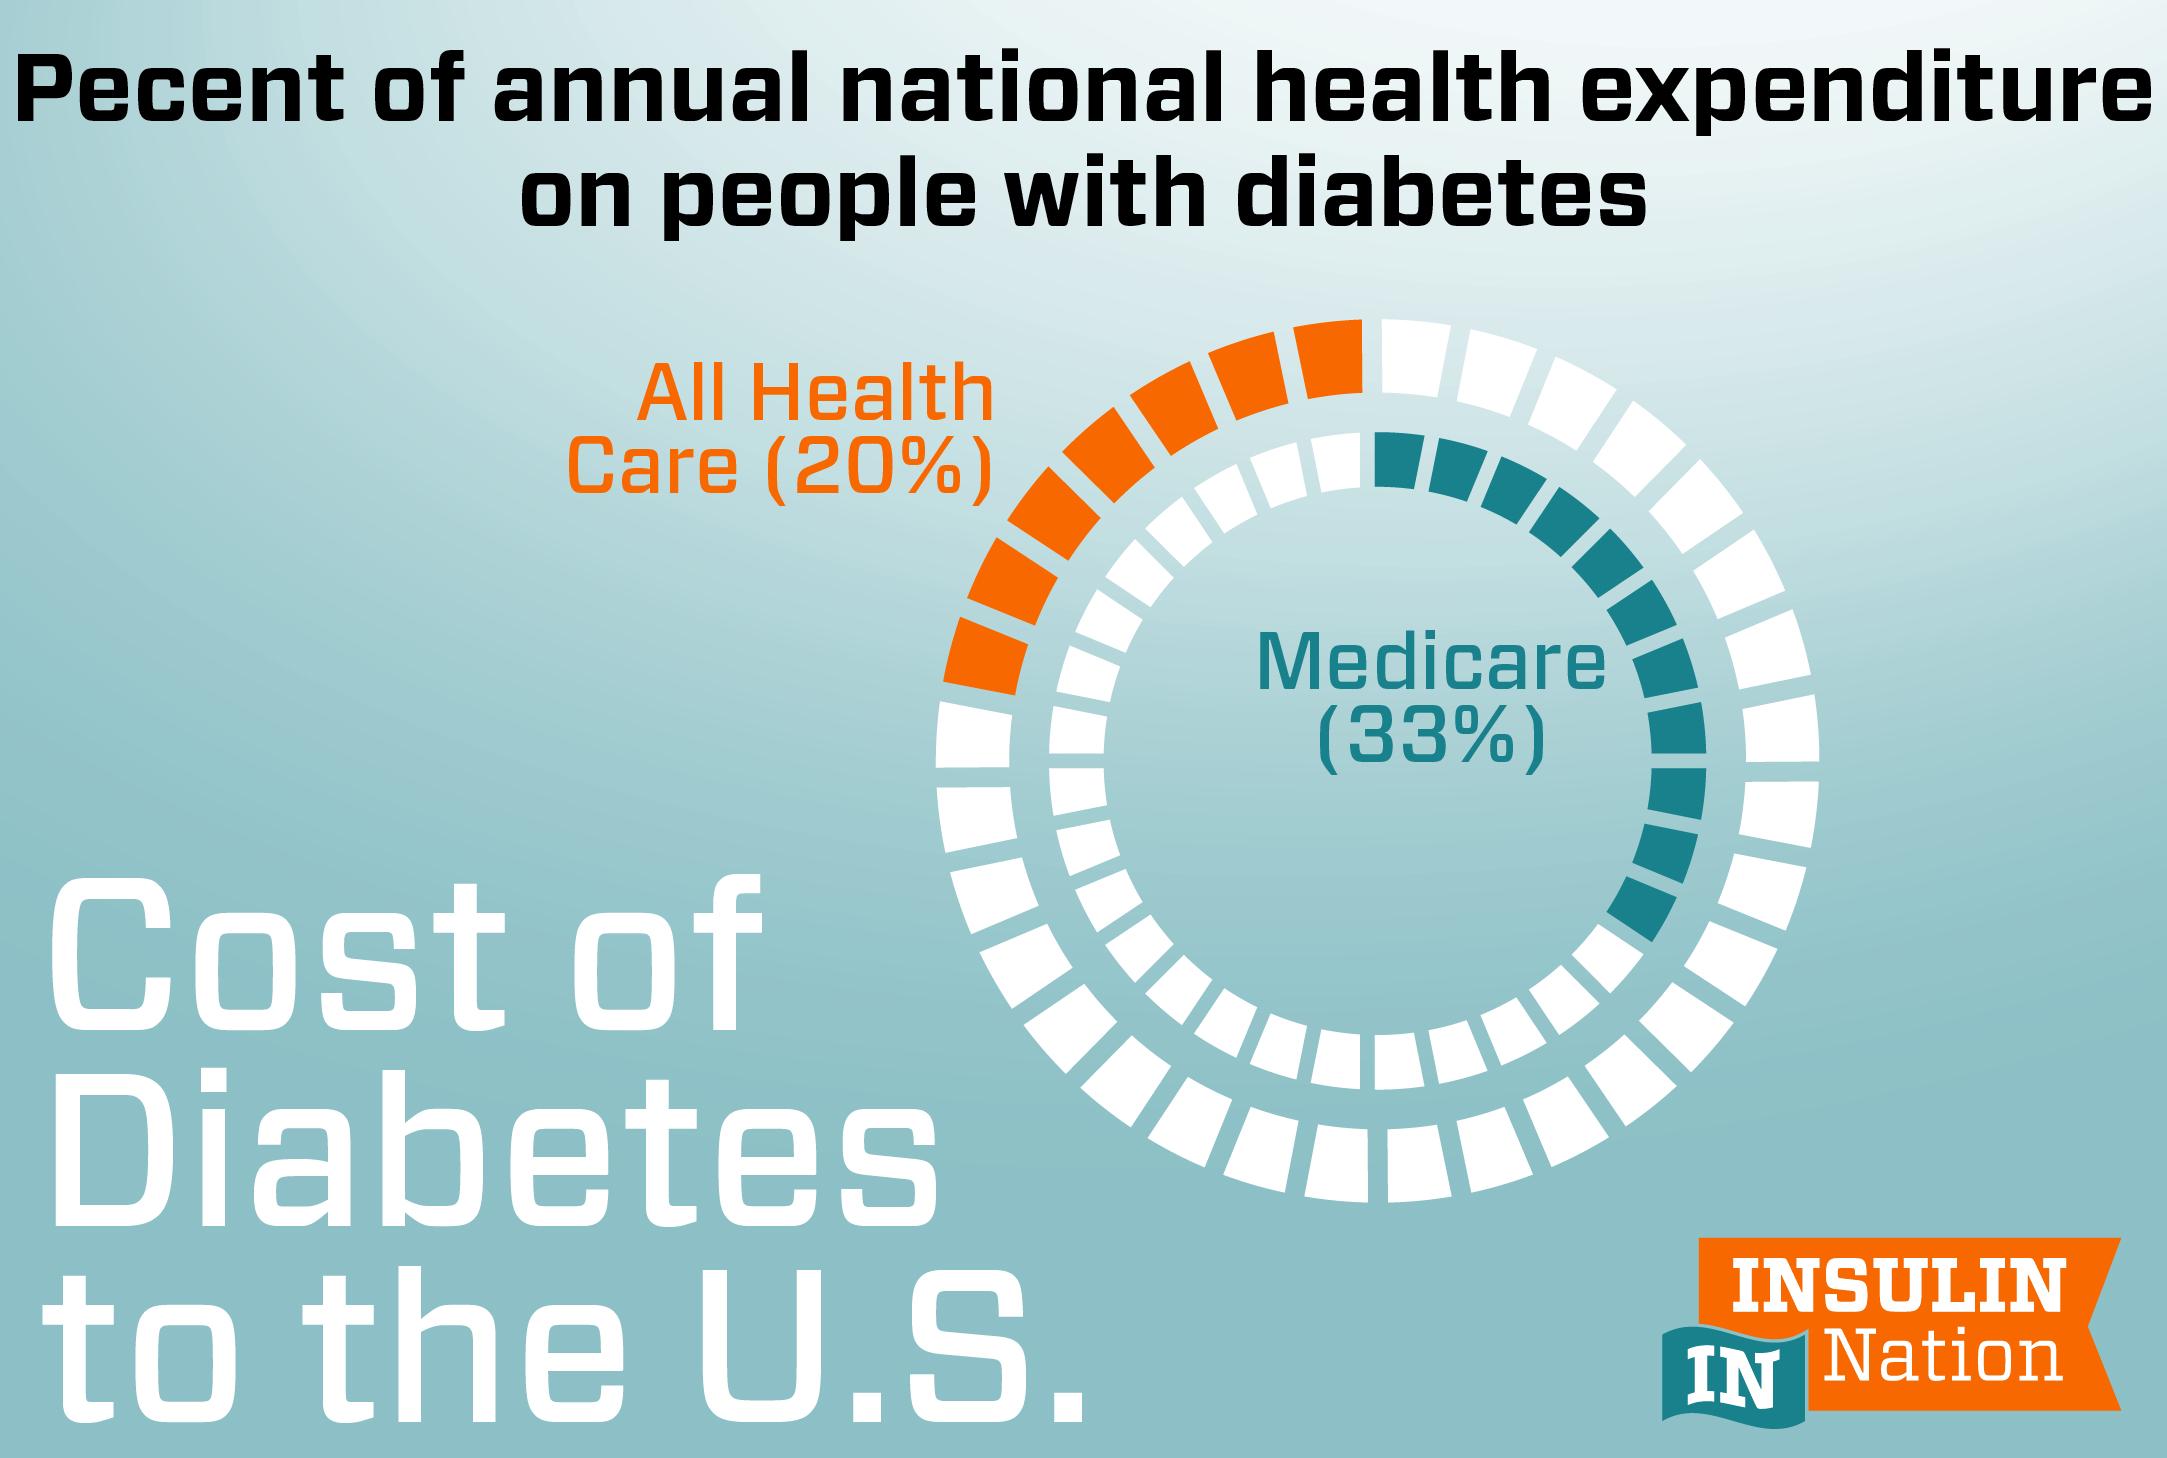 insulin_nation_diabetes_price_usa-01